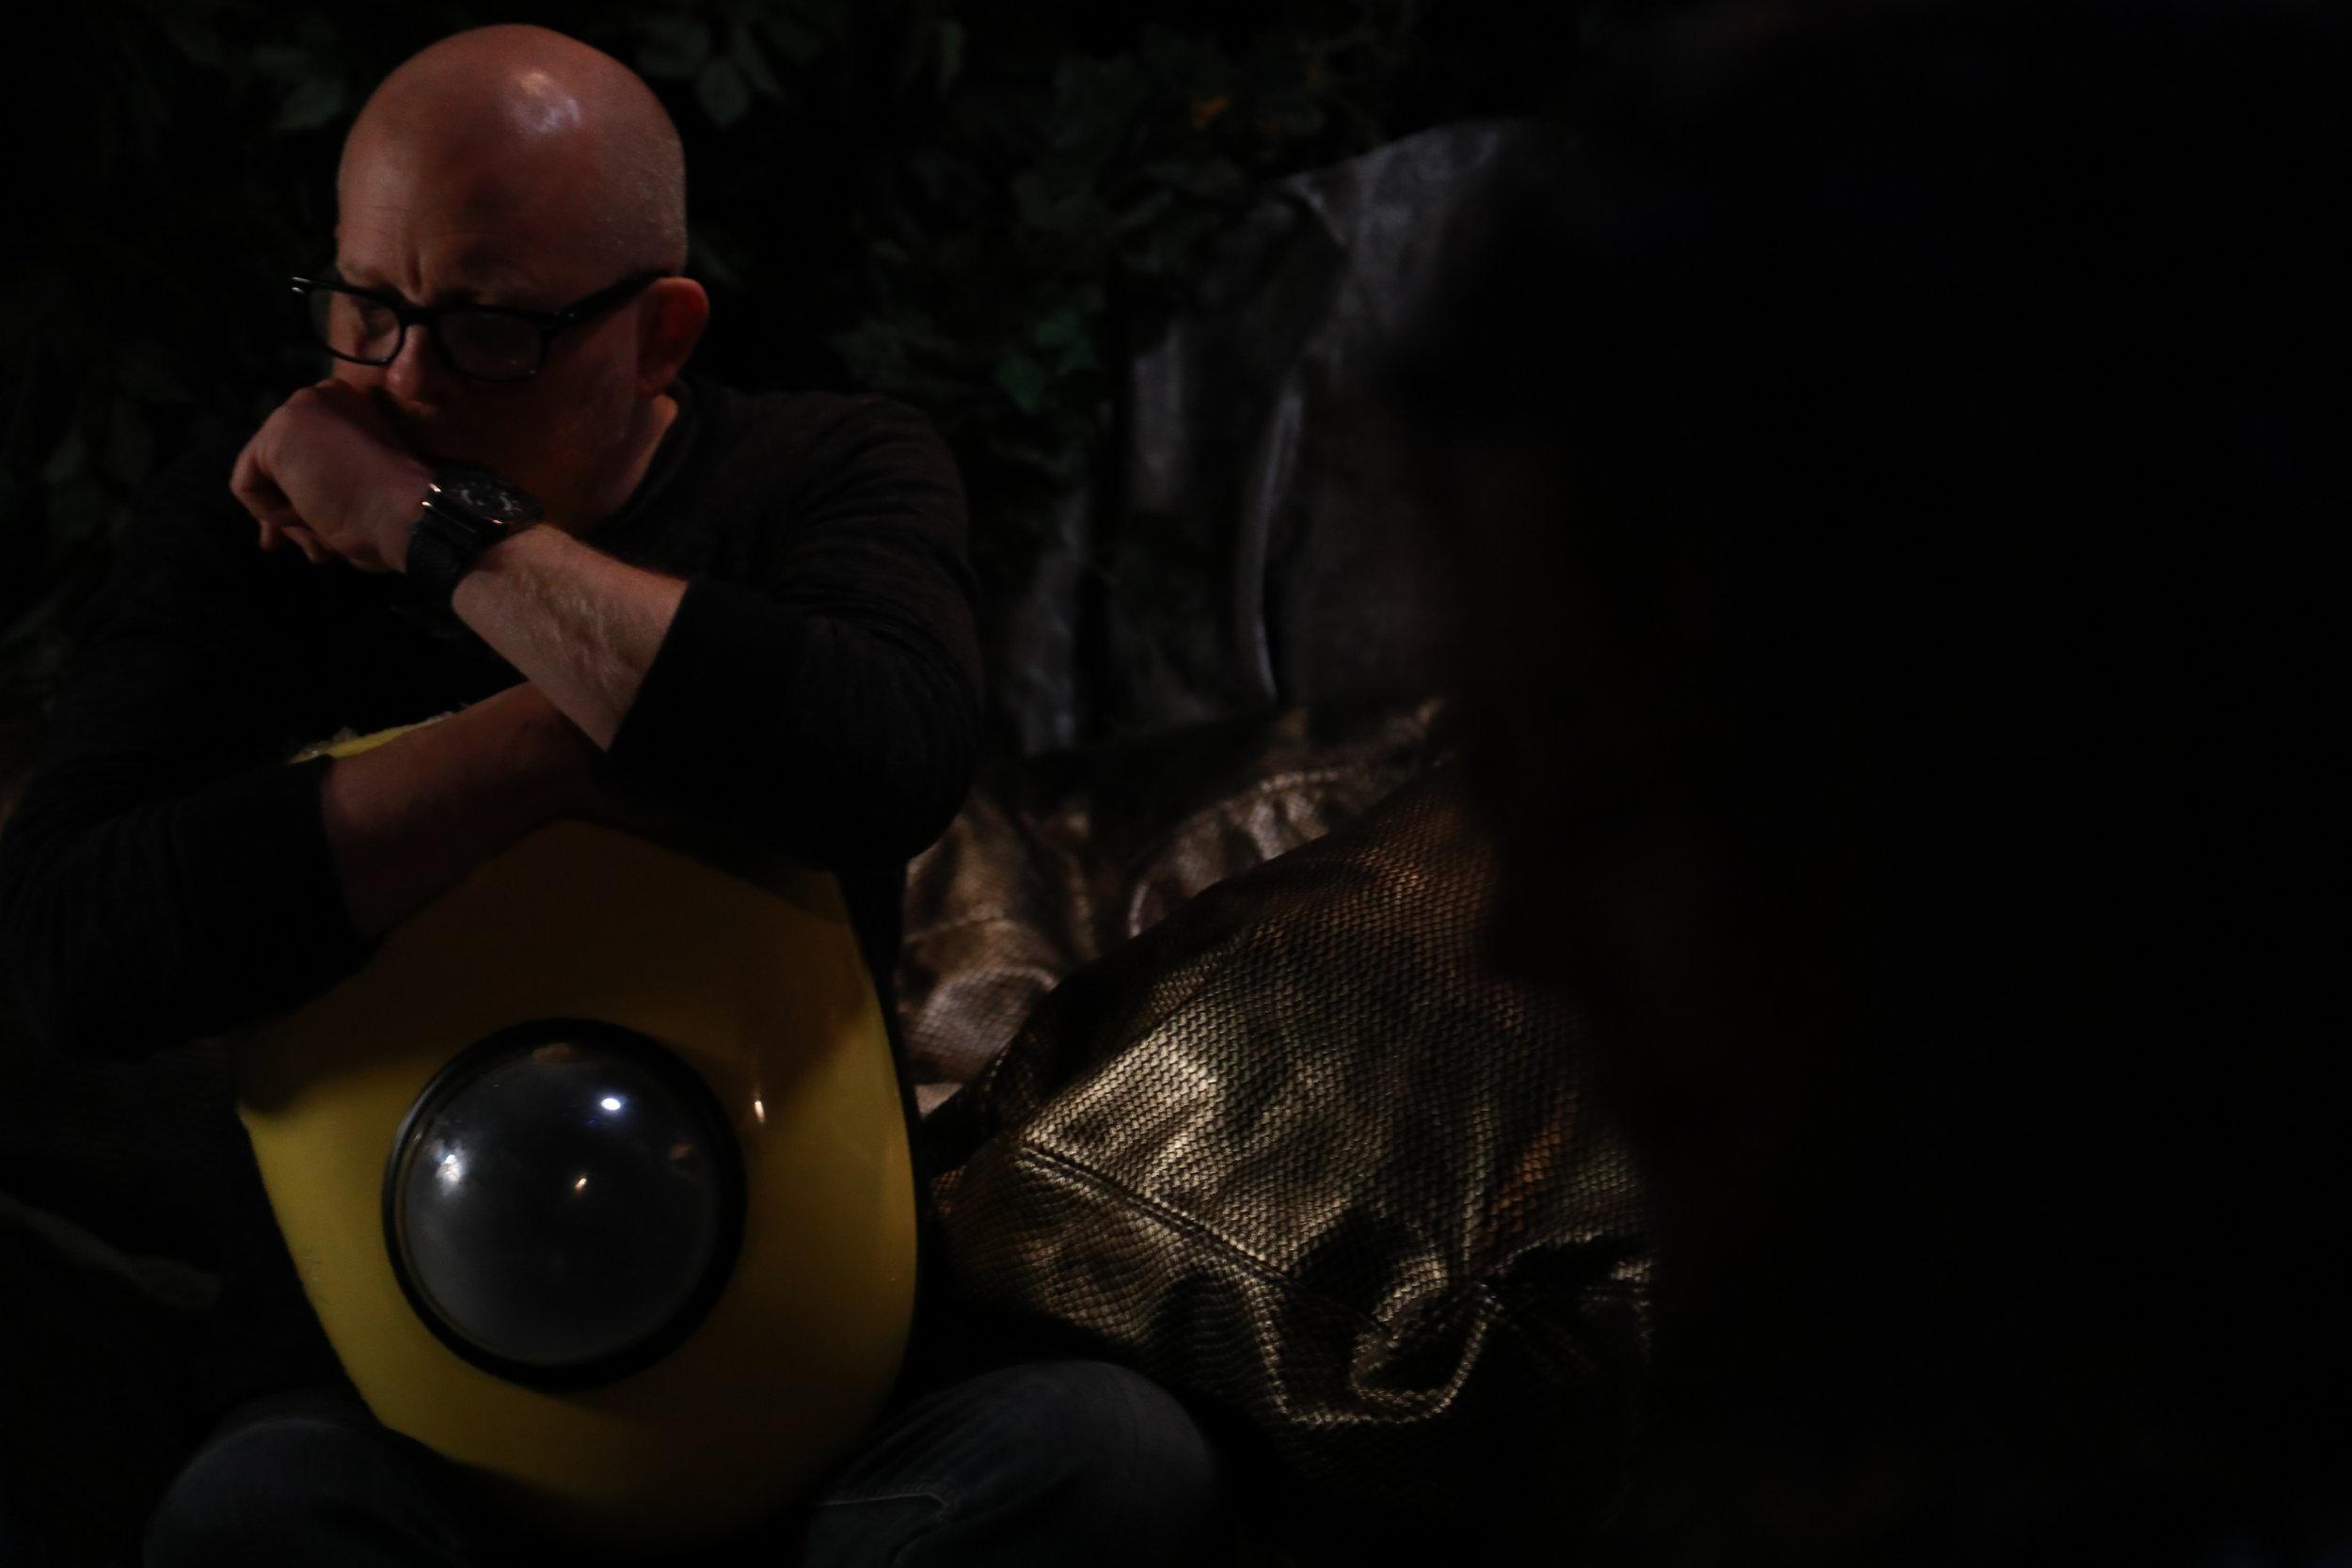 Michael Thomsen / Sculptor + Filmmaker